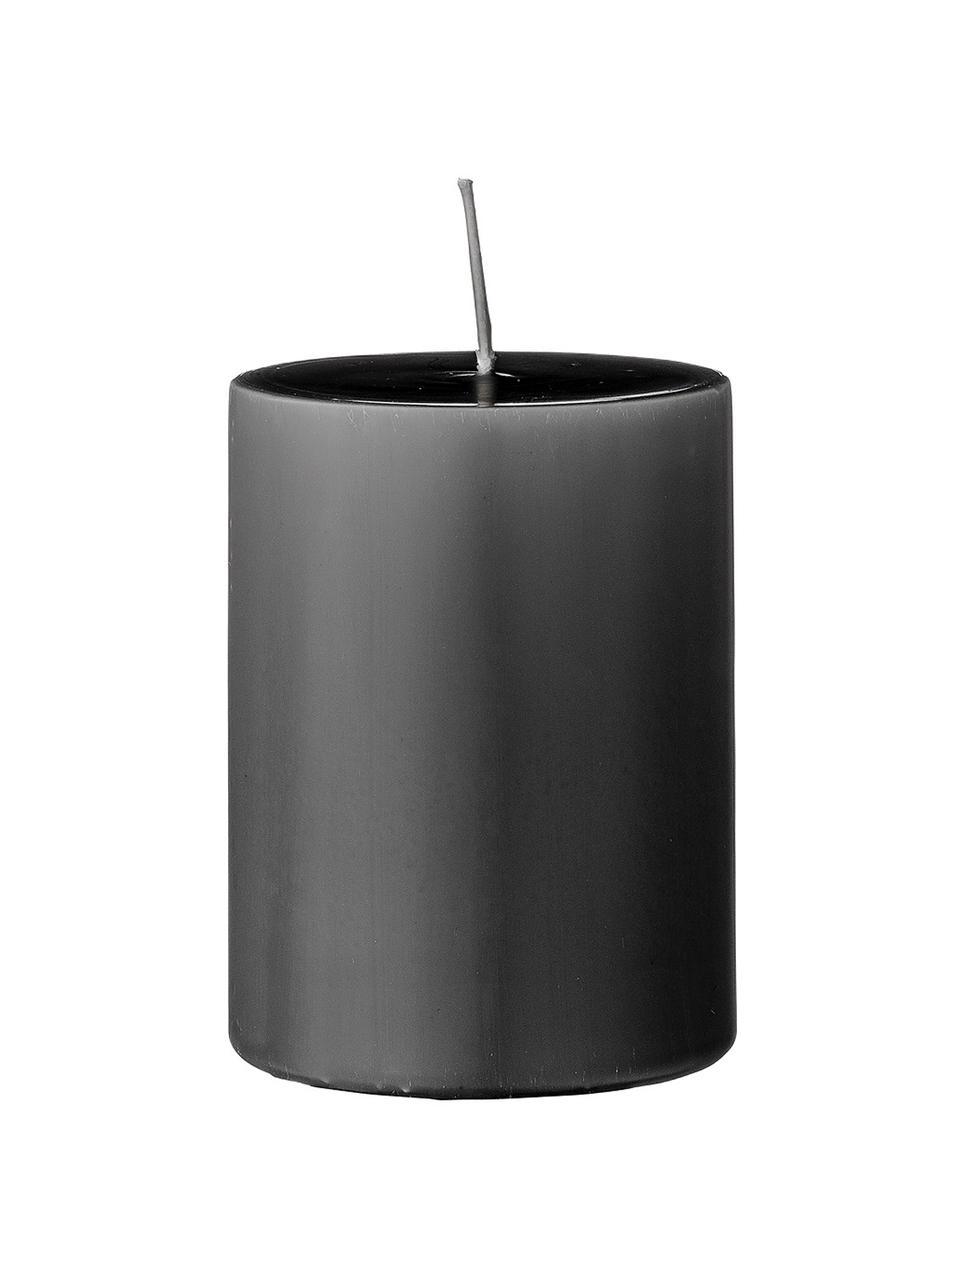 Stumpenkerzen Lulu, 4 Stück, Wachs, Grau, Ø 7 x H 10 cm